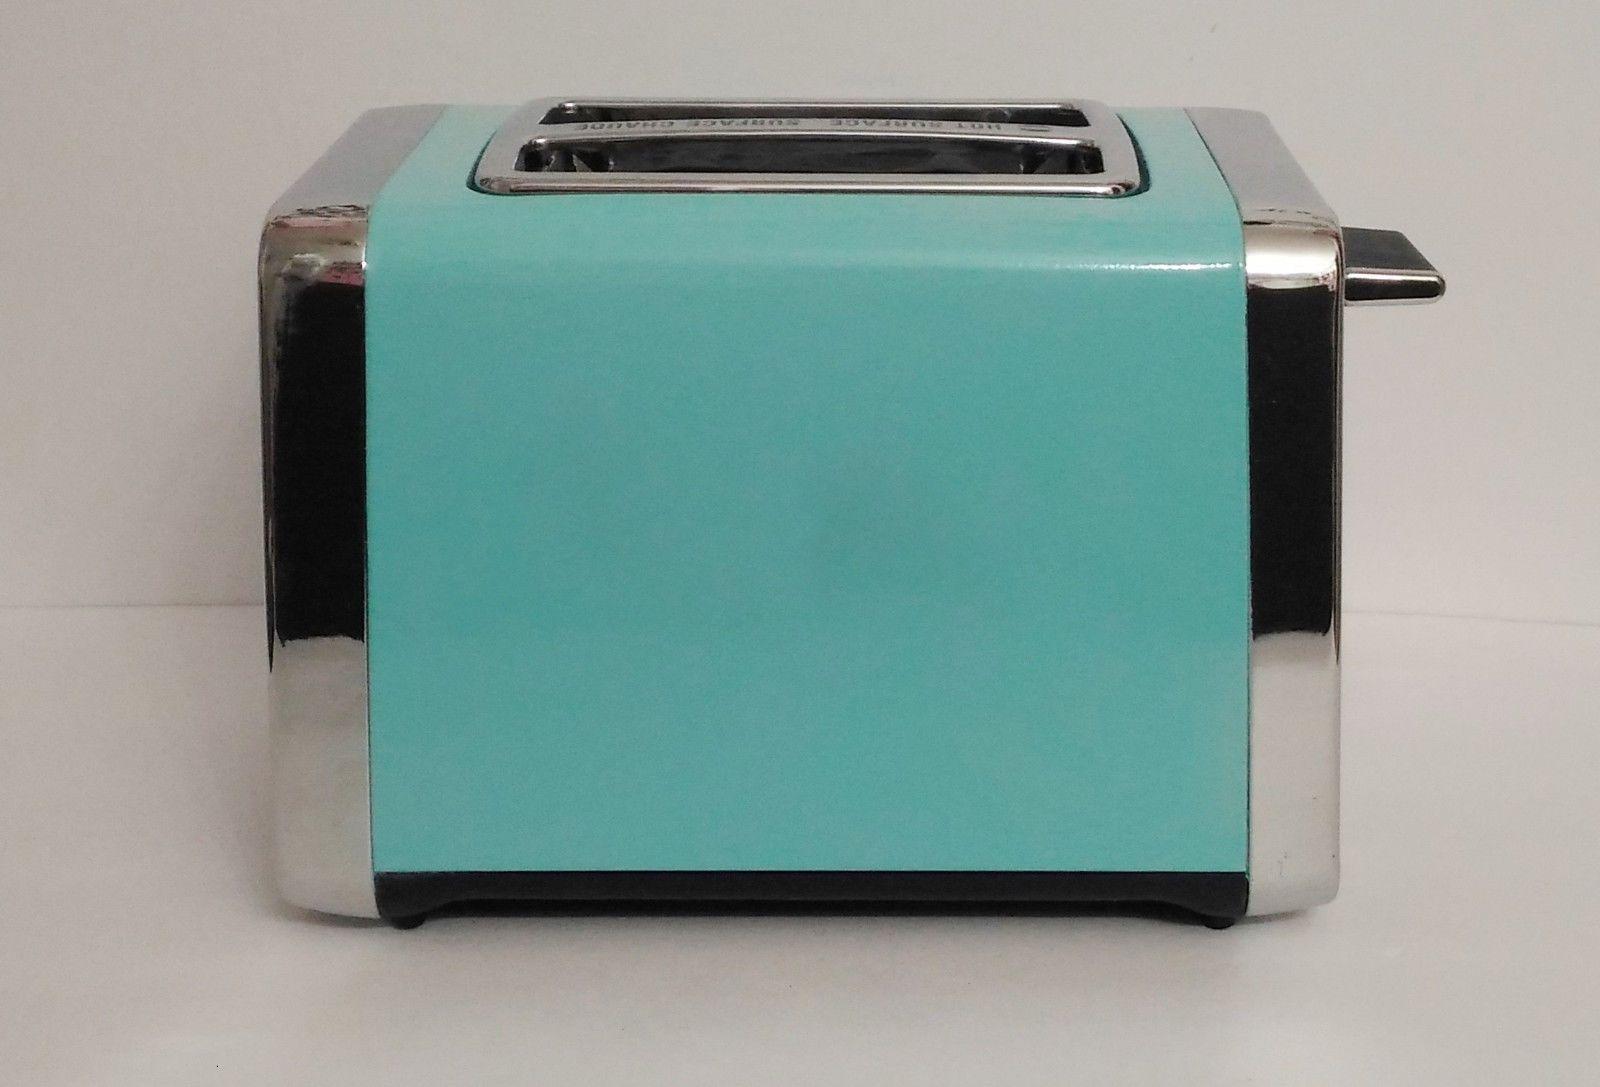 Https Ift Tt 2zmcgea Toasters Ideas Of Toasters Toasters Hamilton Beach Aqua Sky Retro Style Toaster C Kitchen Aid Hamilton Beach Kitchenaid Toaster